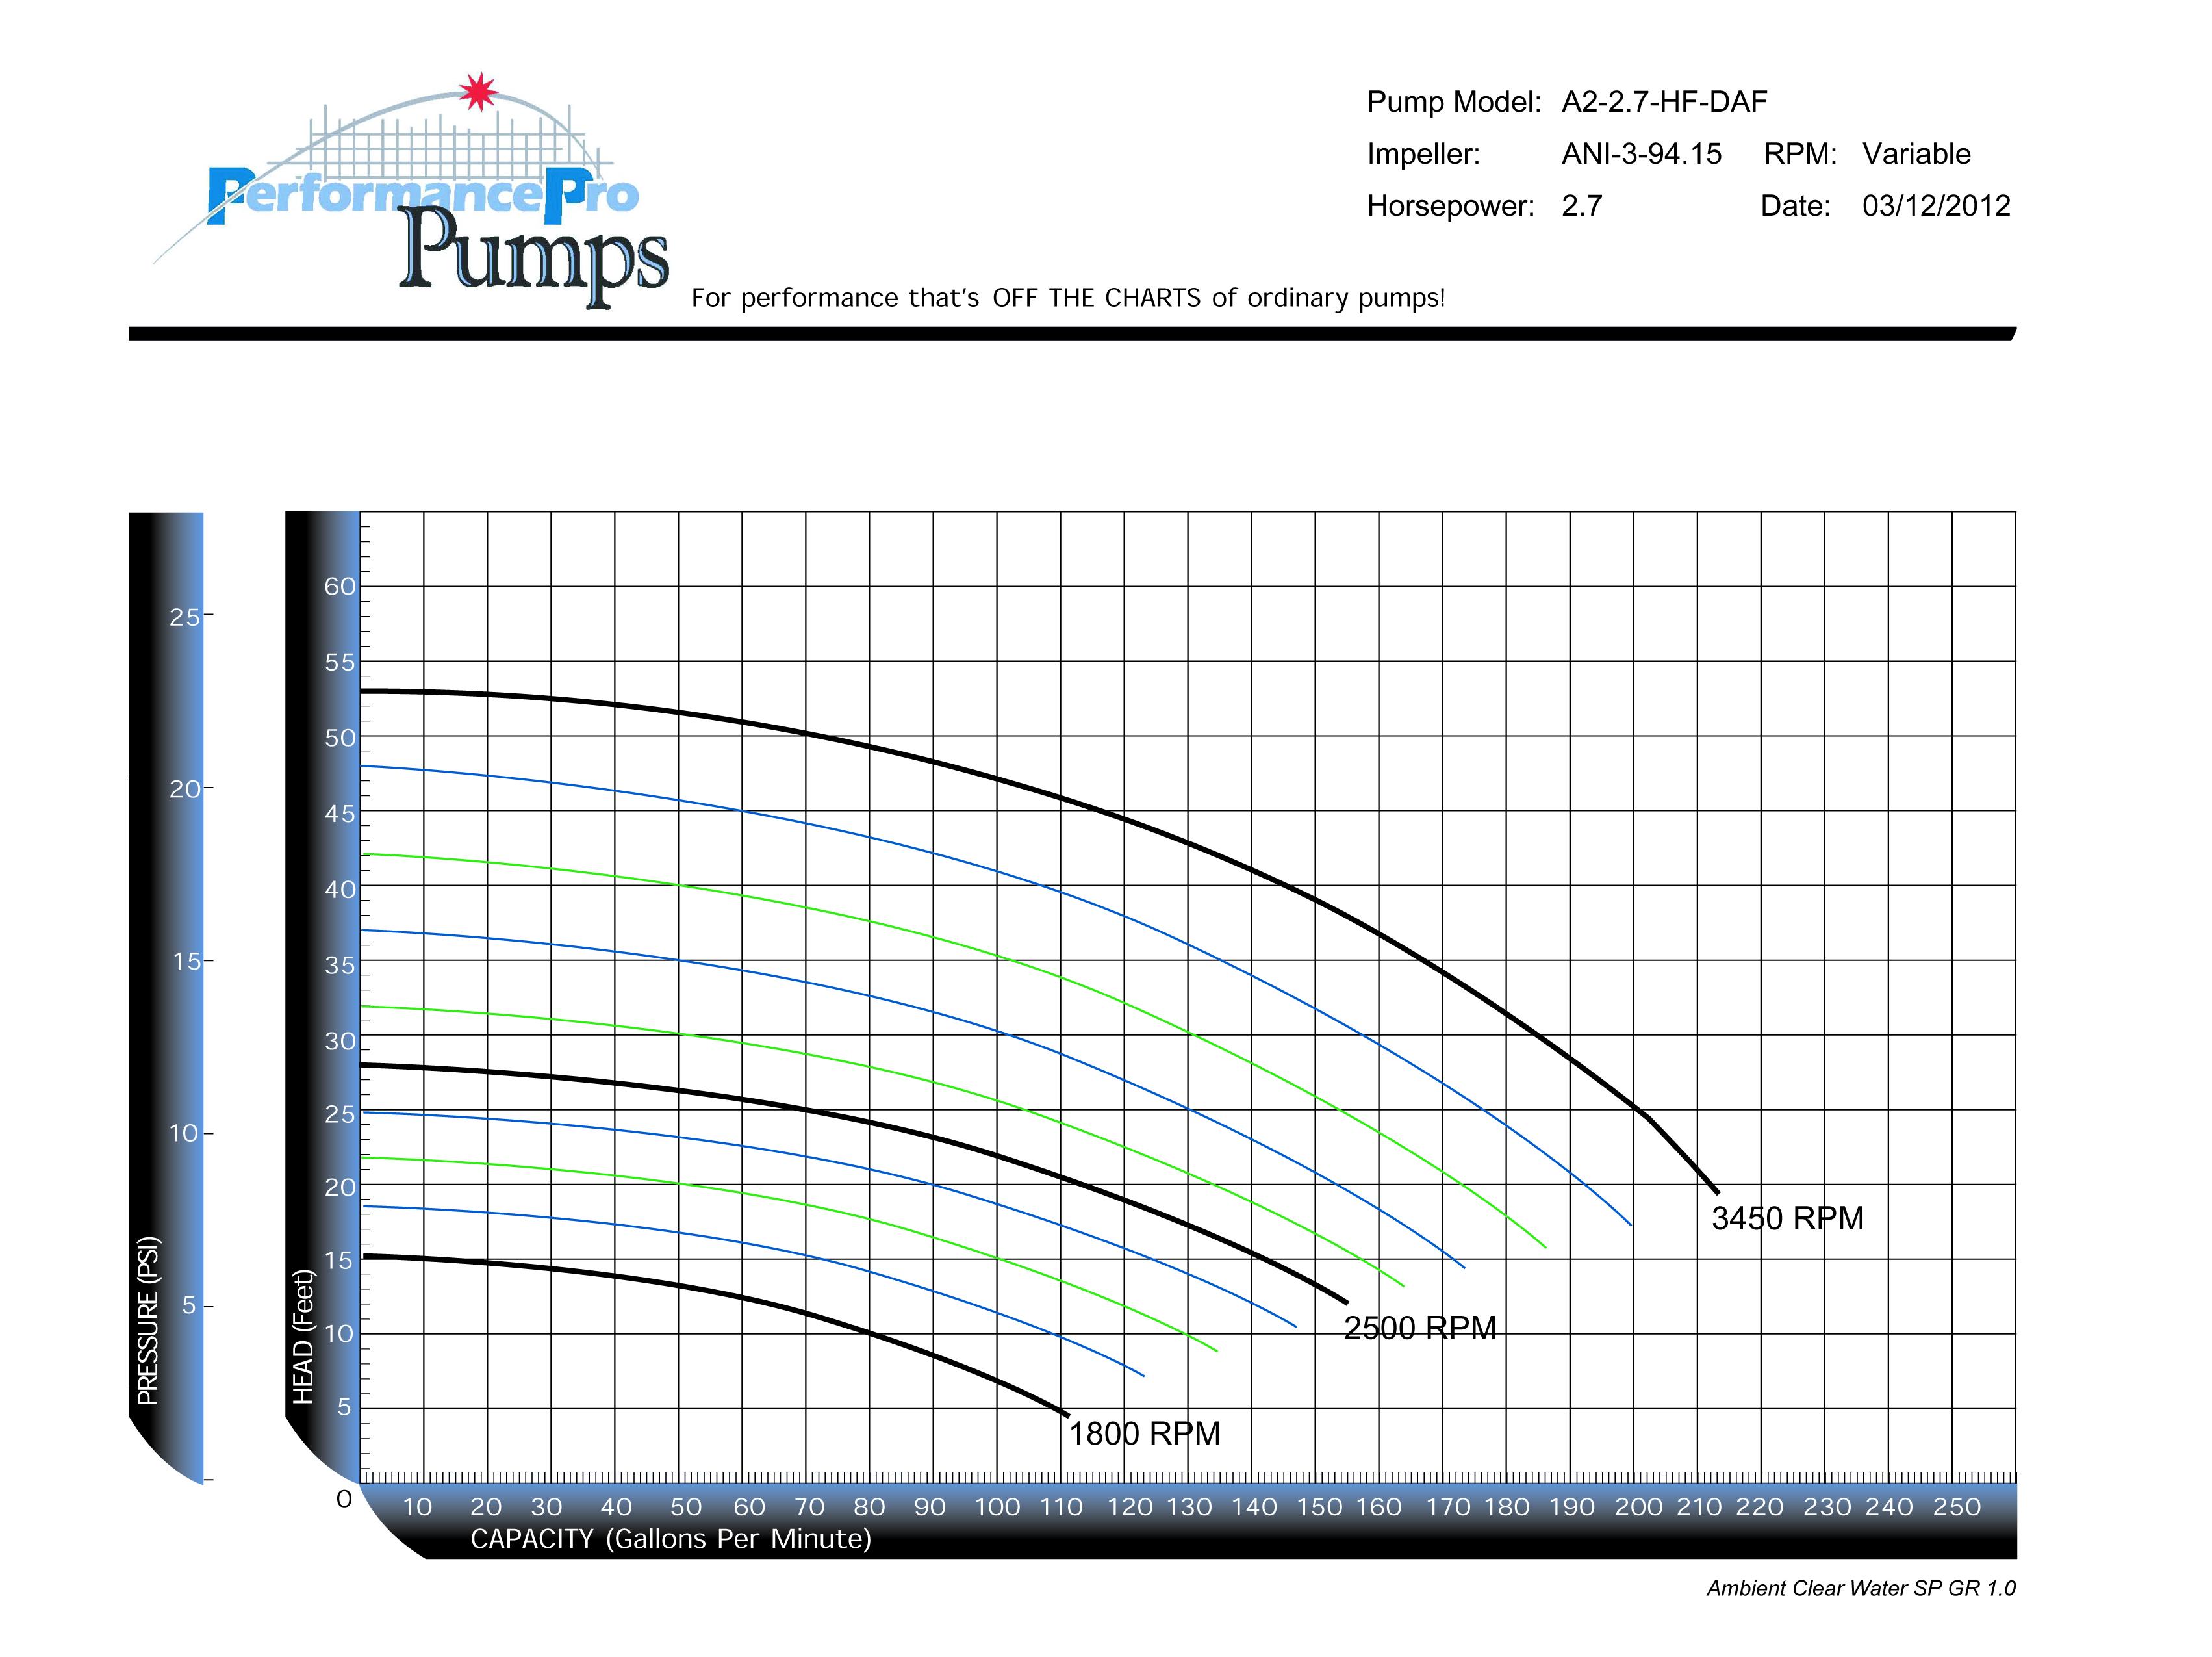 Artesian2 DAF 2.7HP HF curve